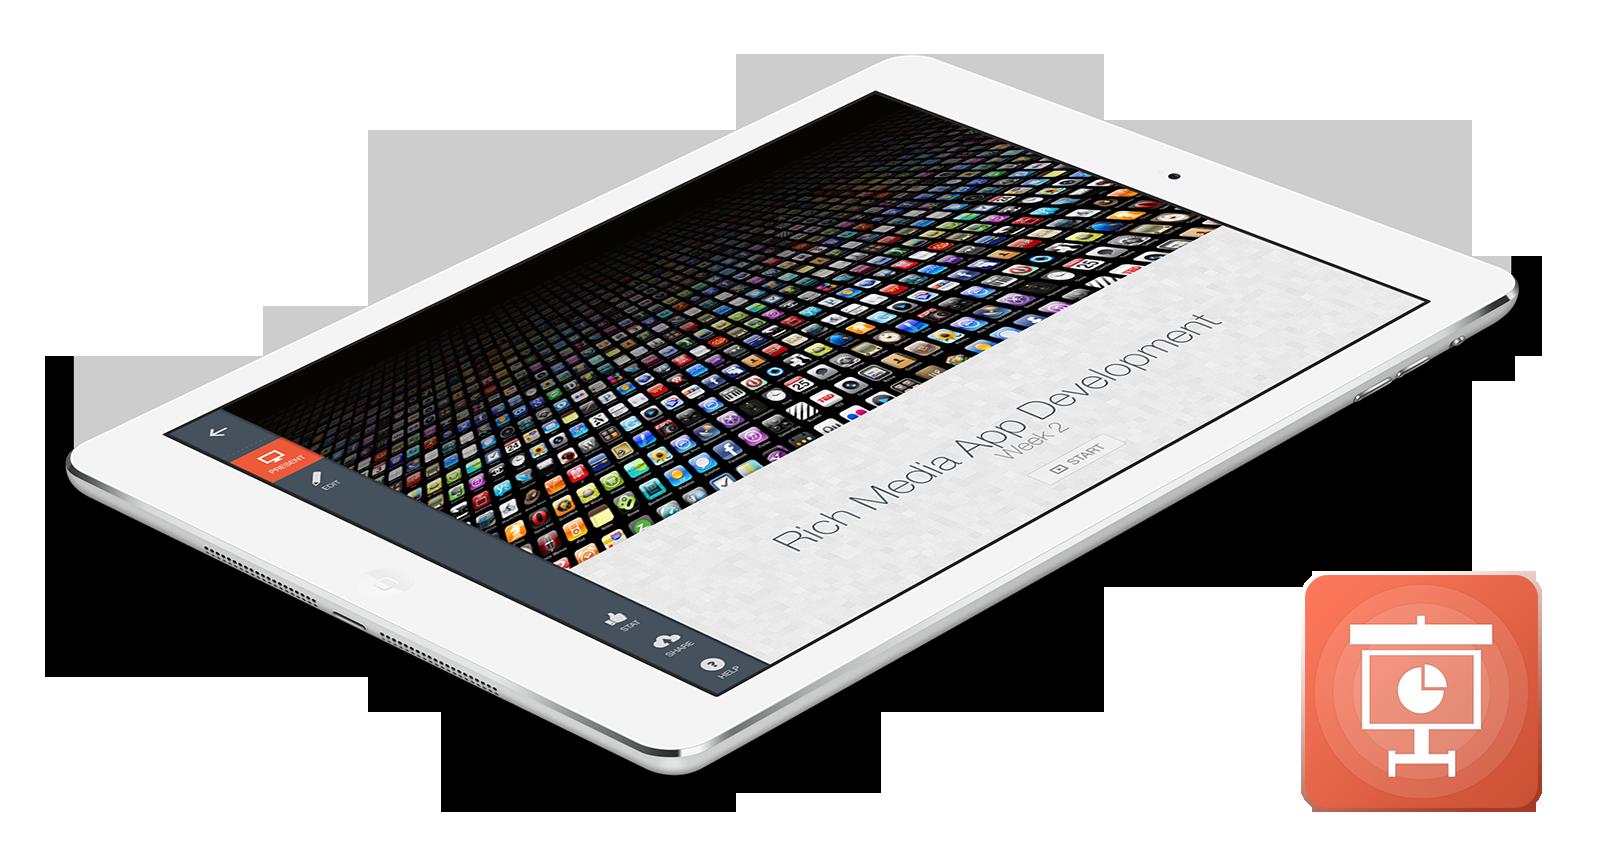 Presentics 2.0 is presentation app born for the iPad